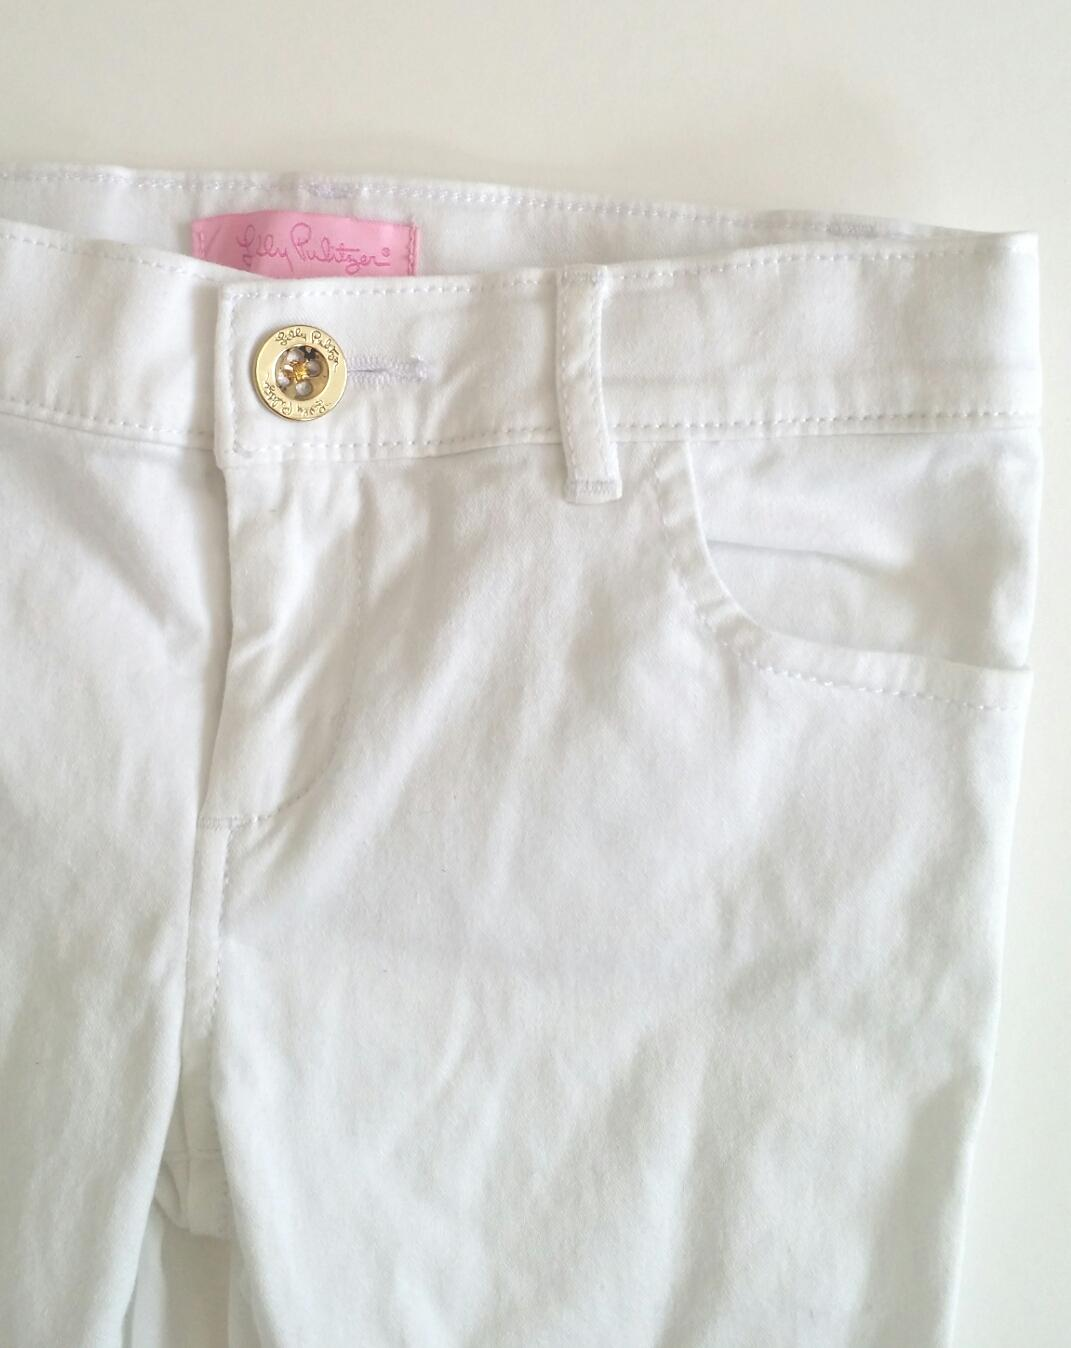 Lilly-Putitzer-4-YEARS-Straight-Leg-Pants_2069309B.jpg